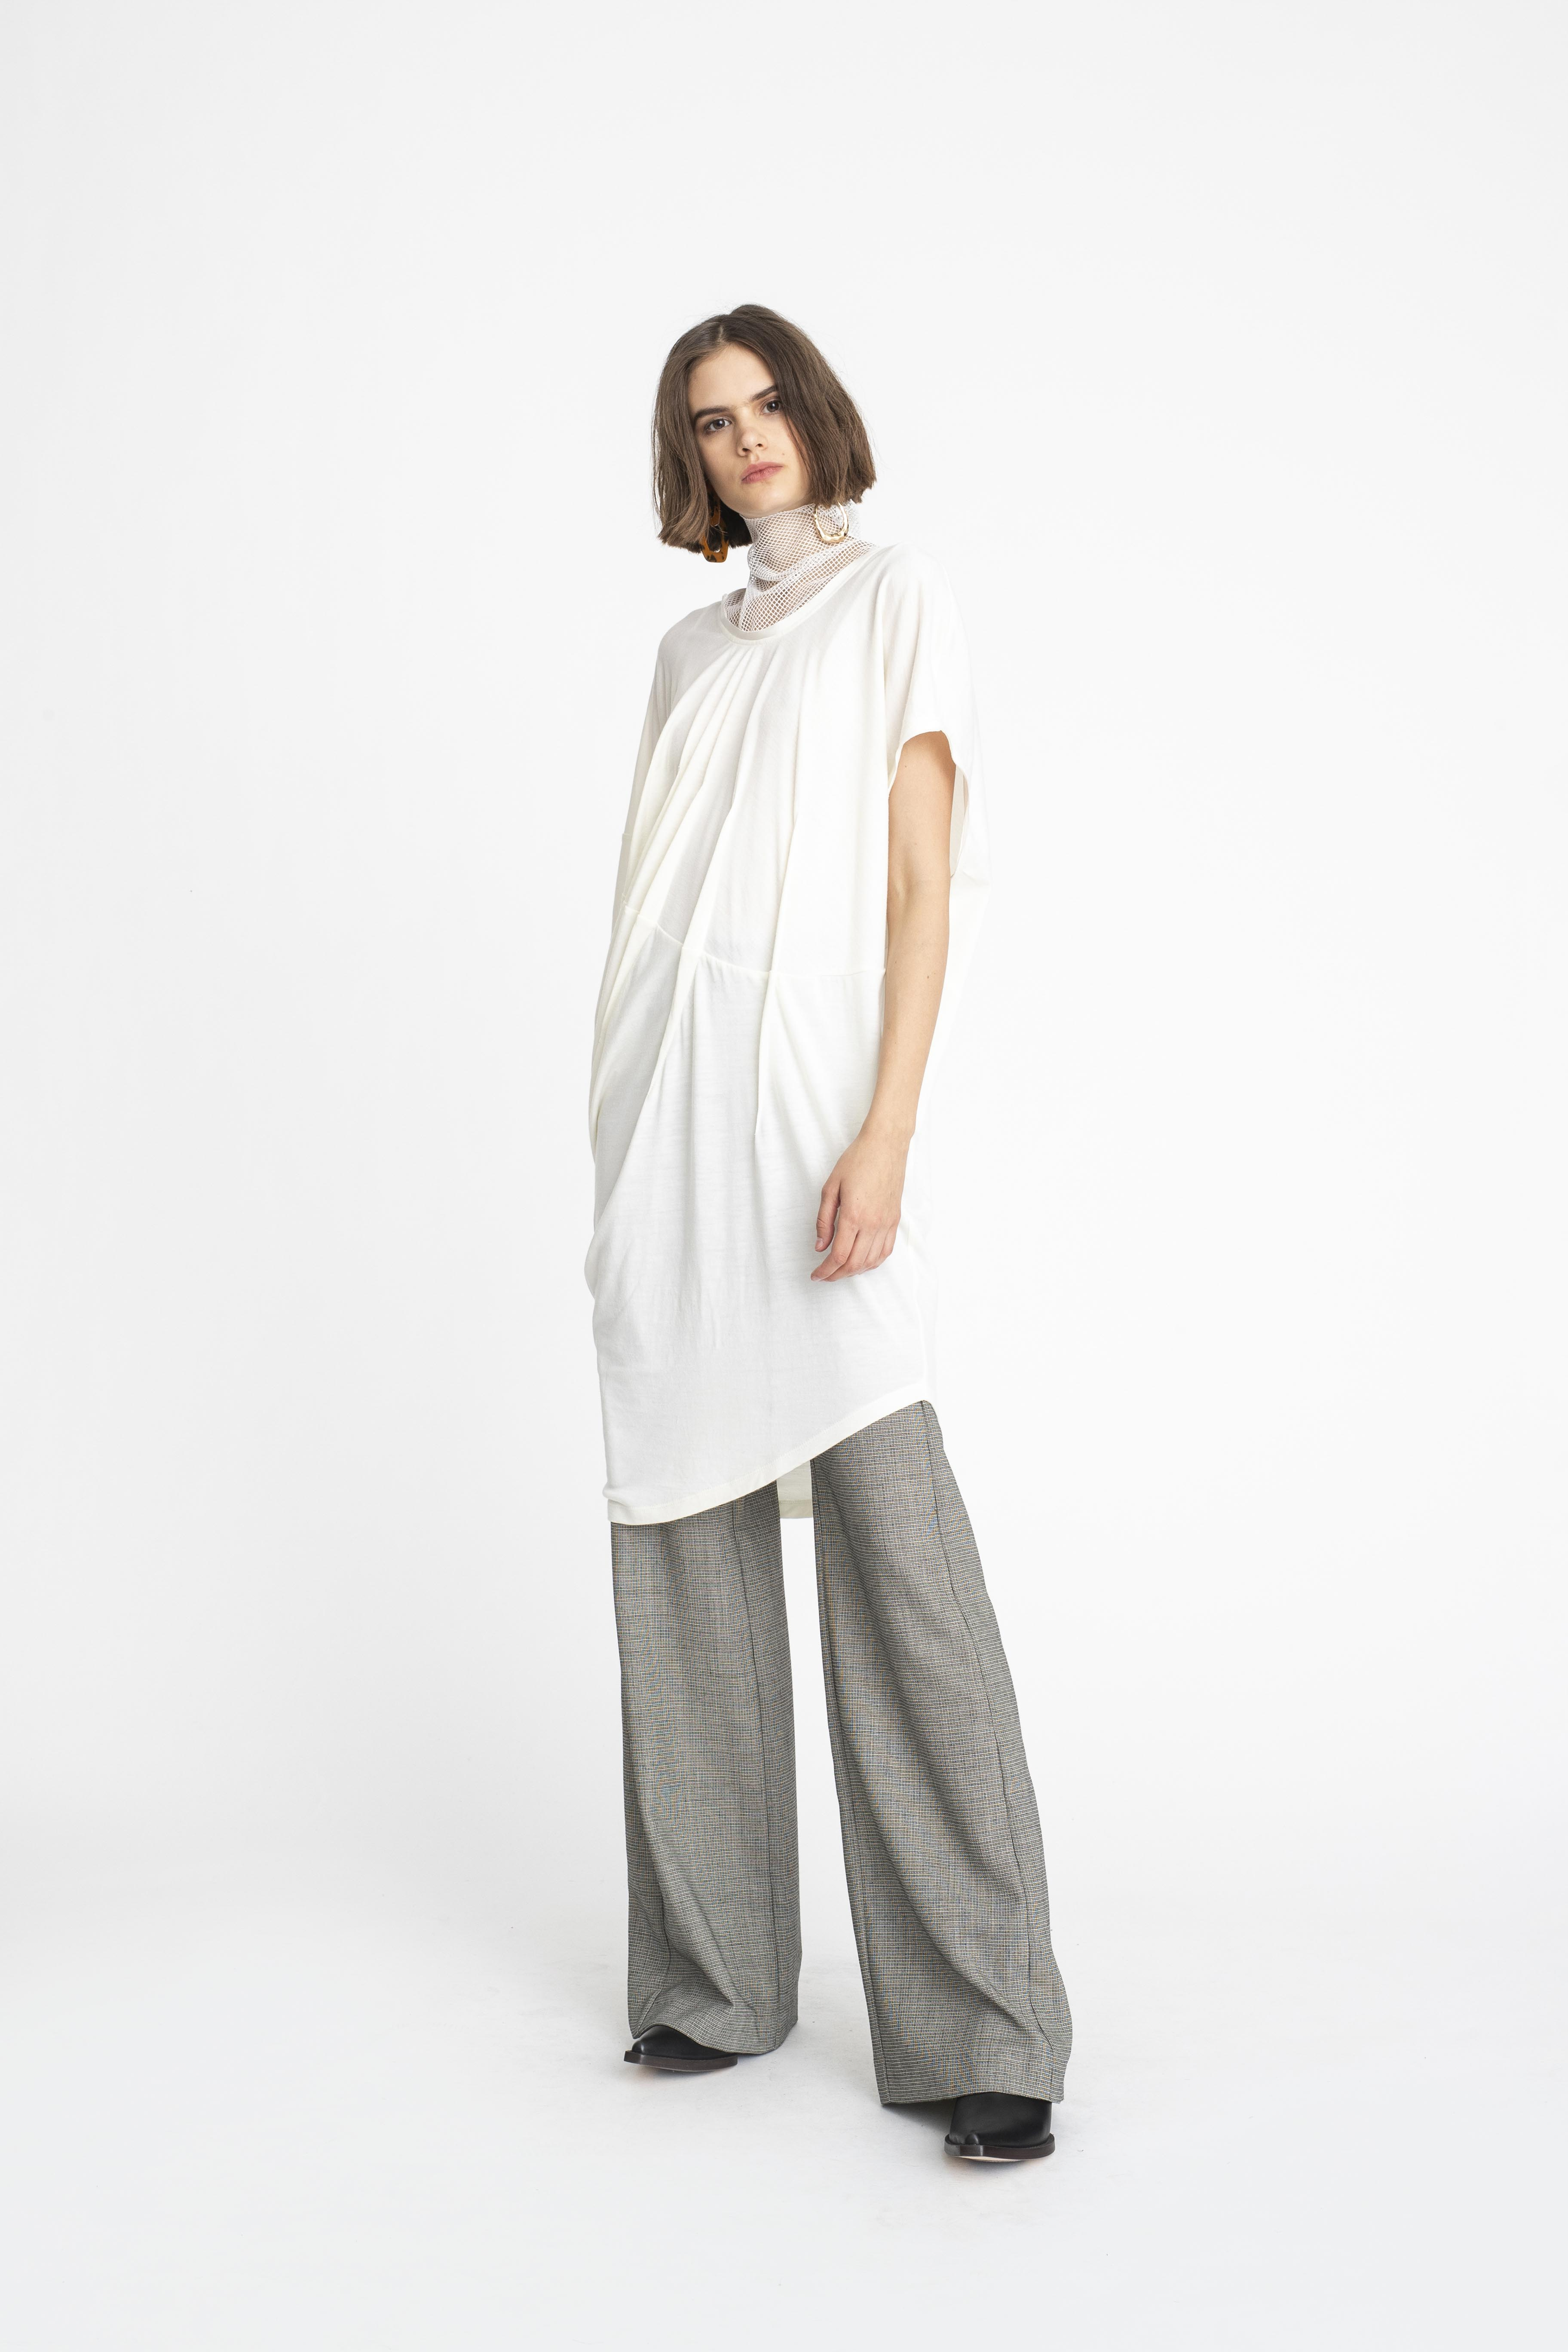 Diminish-Dress_Undone-Tunic_Panelled-Joust-Pant_TaylorBoutique_AW19_L115_2539 2